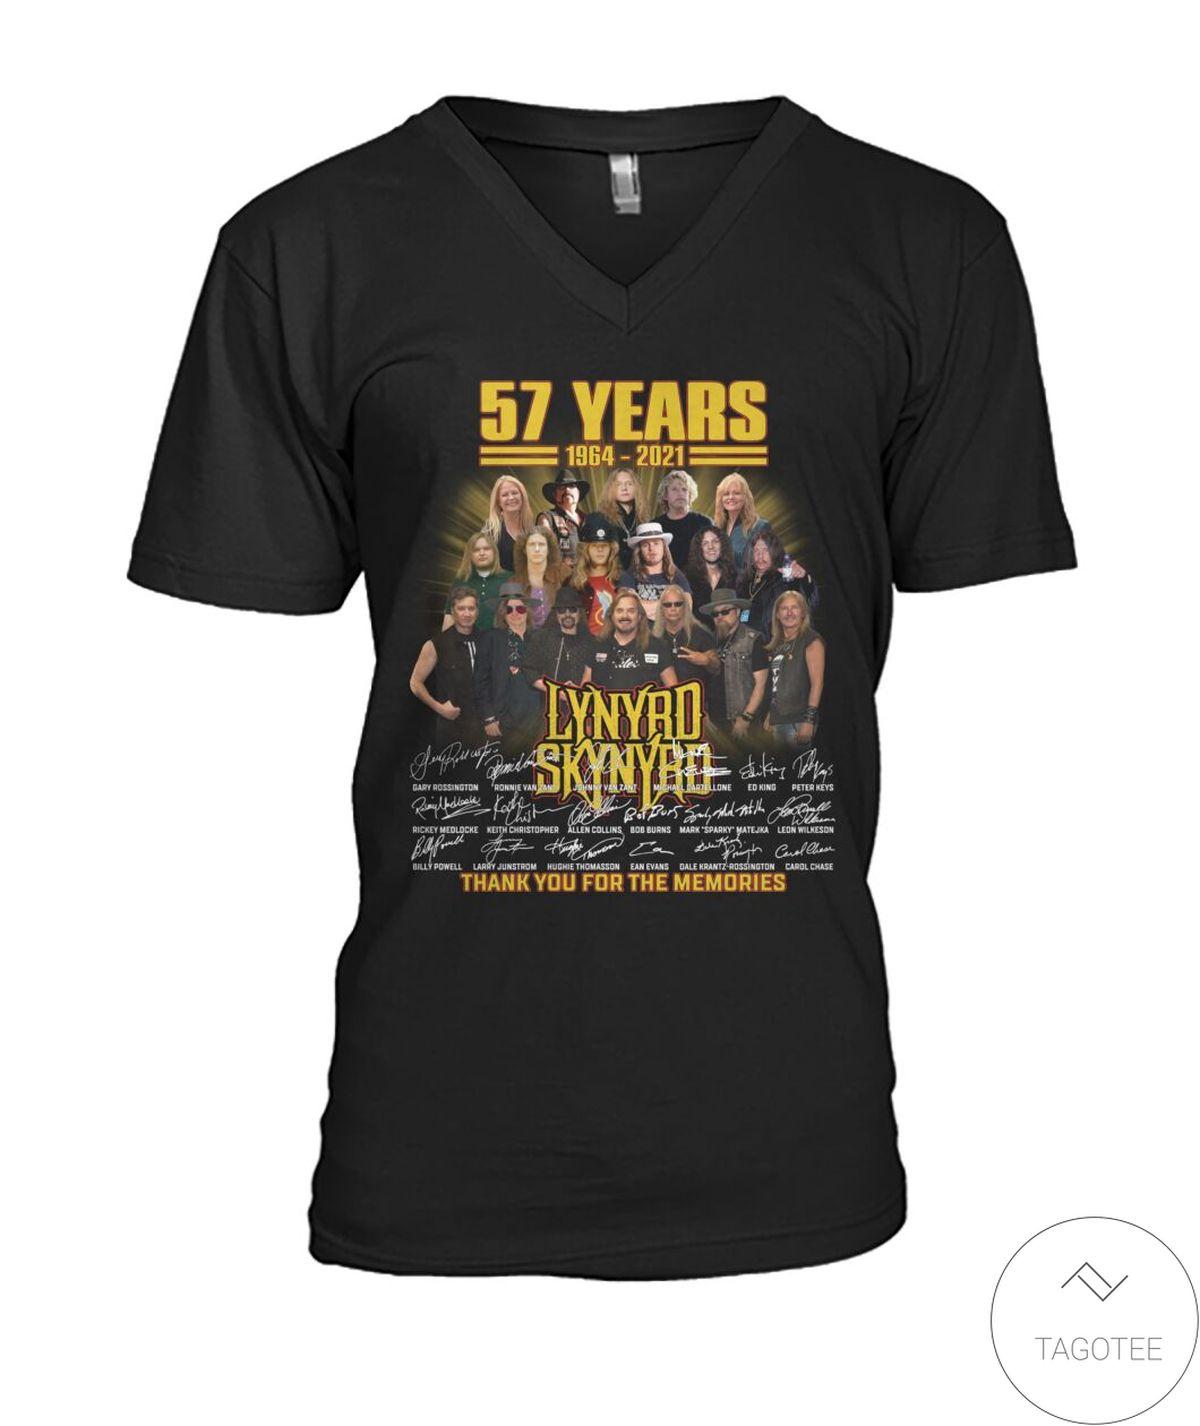 Print On Demand Lynyrd Skynyrd 57 Years Thank You For The Memories Shirt, hoodie, tank top